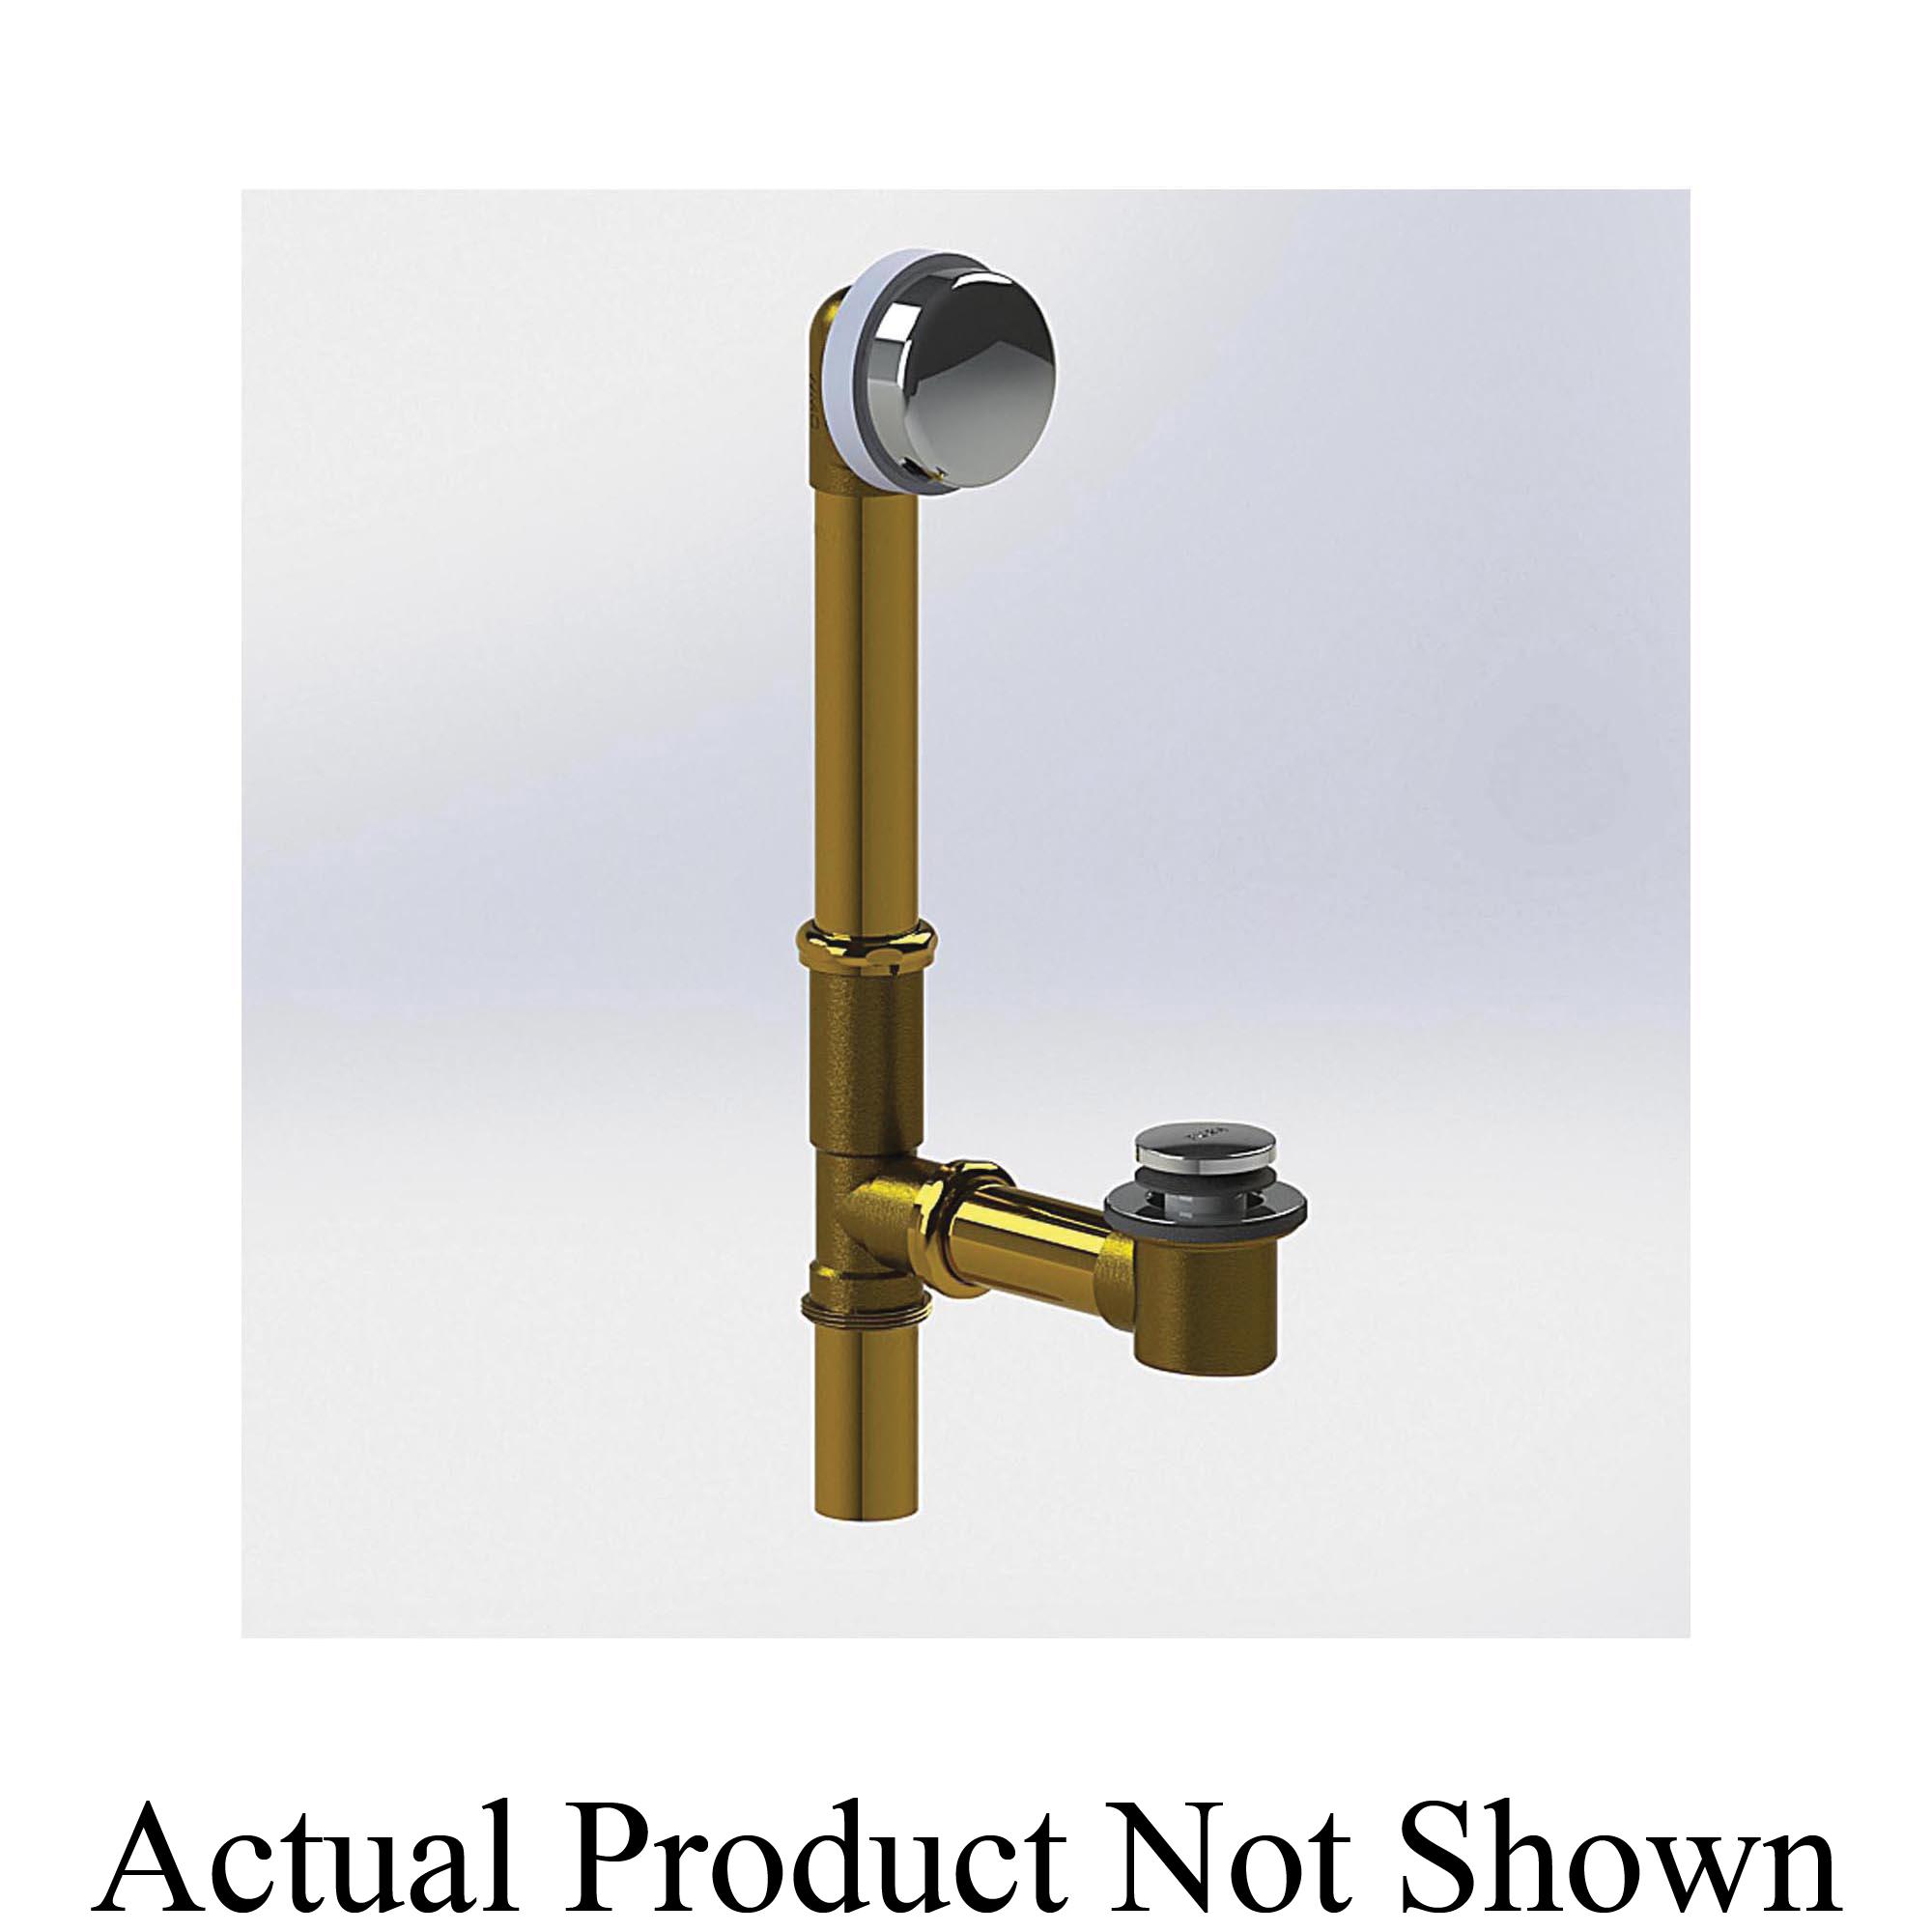 Watco® 591-FA-BRS-CP-U Innovator® 591 Slip Joint Complete Bath Waste, Brass, Polished Chrome